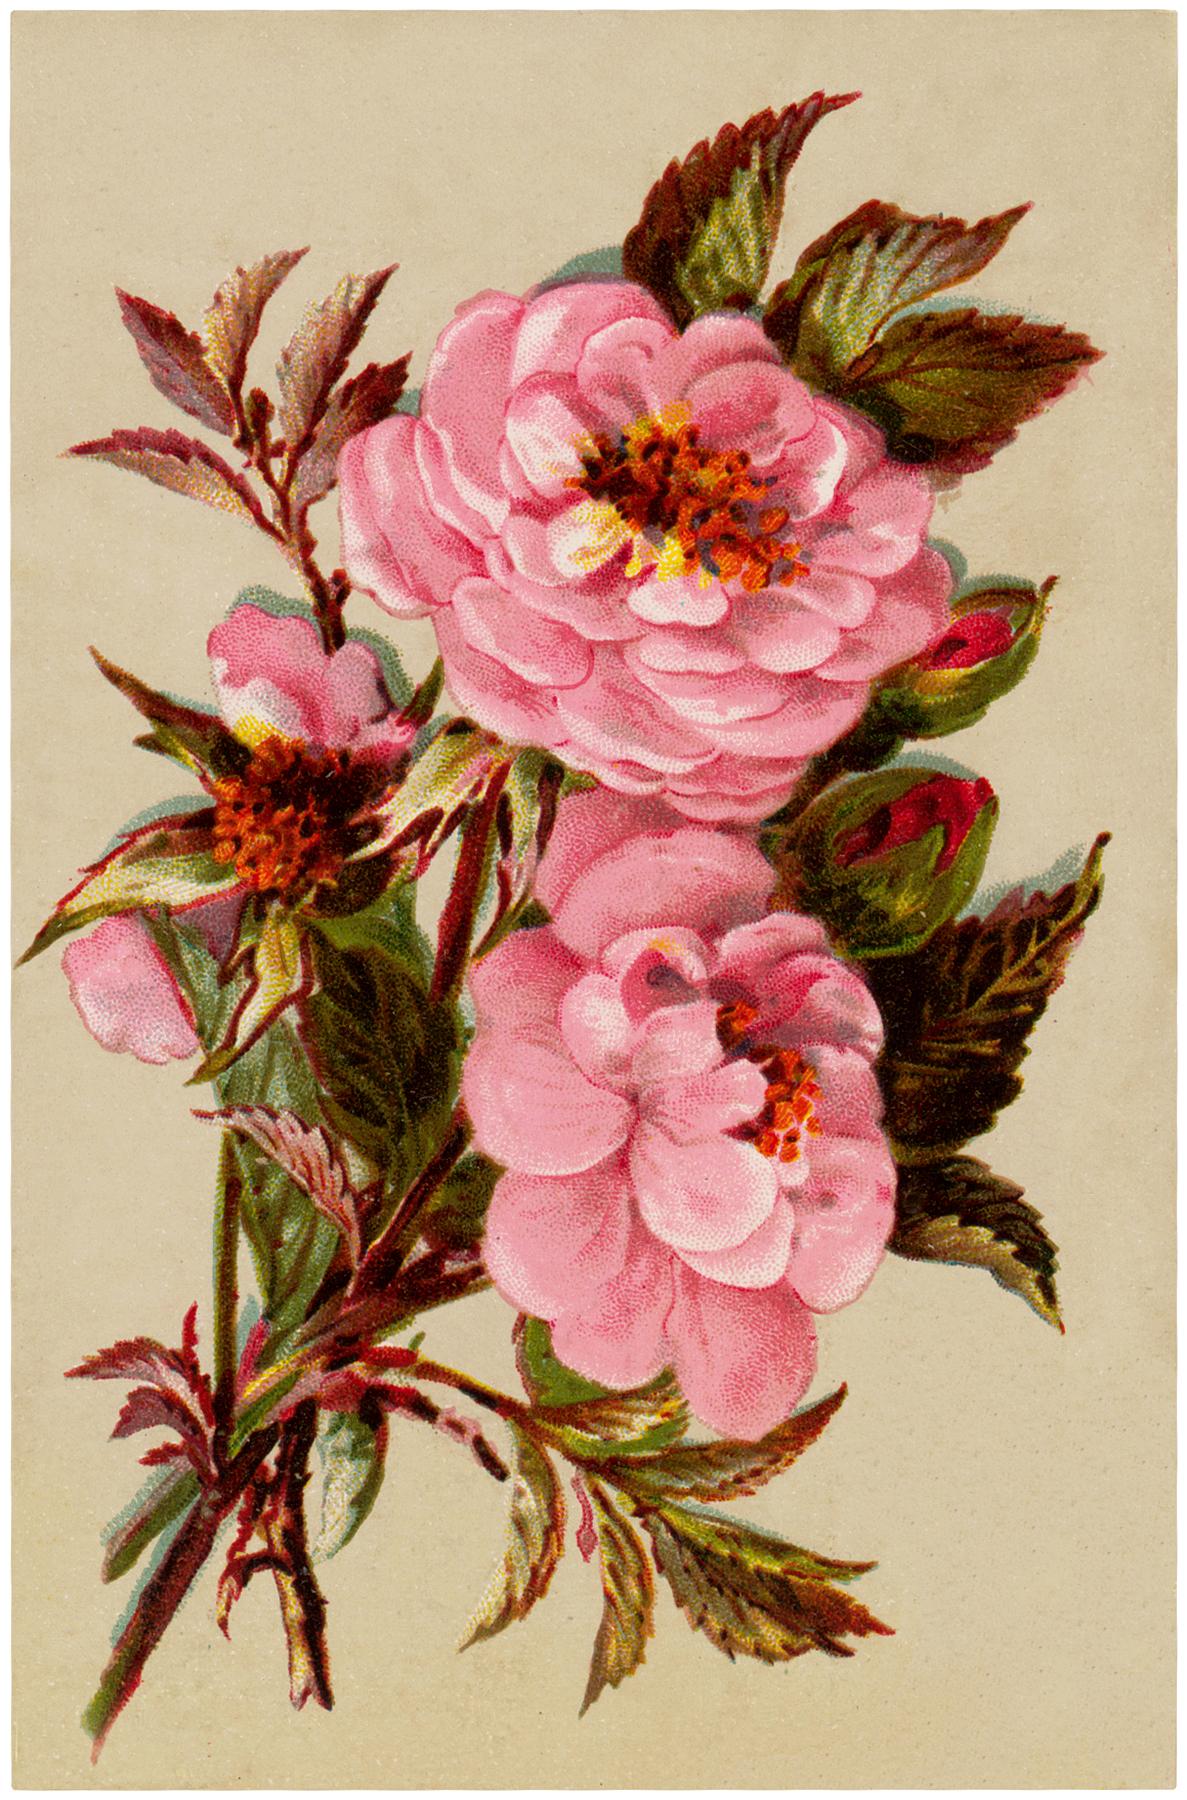 Vintage Pink Roses Image